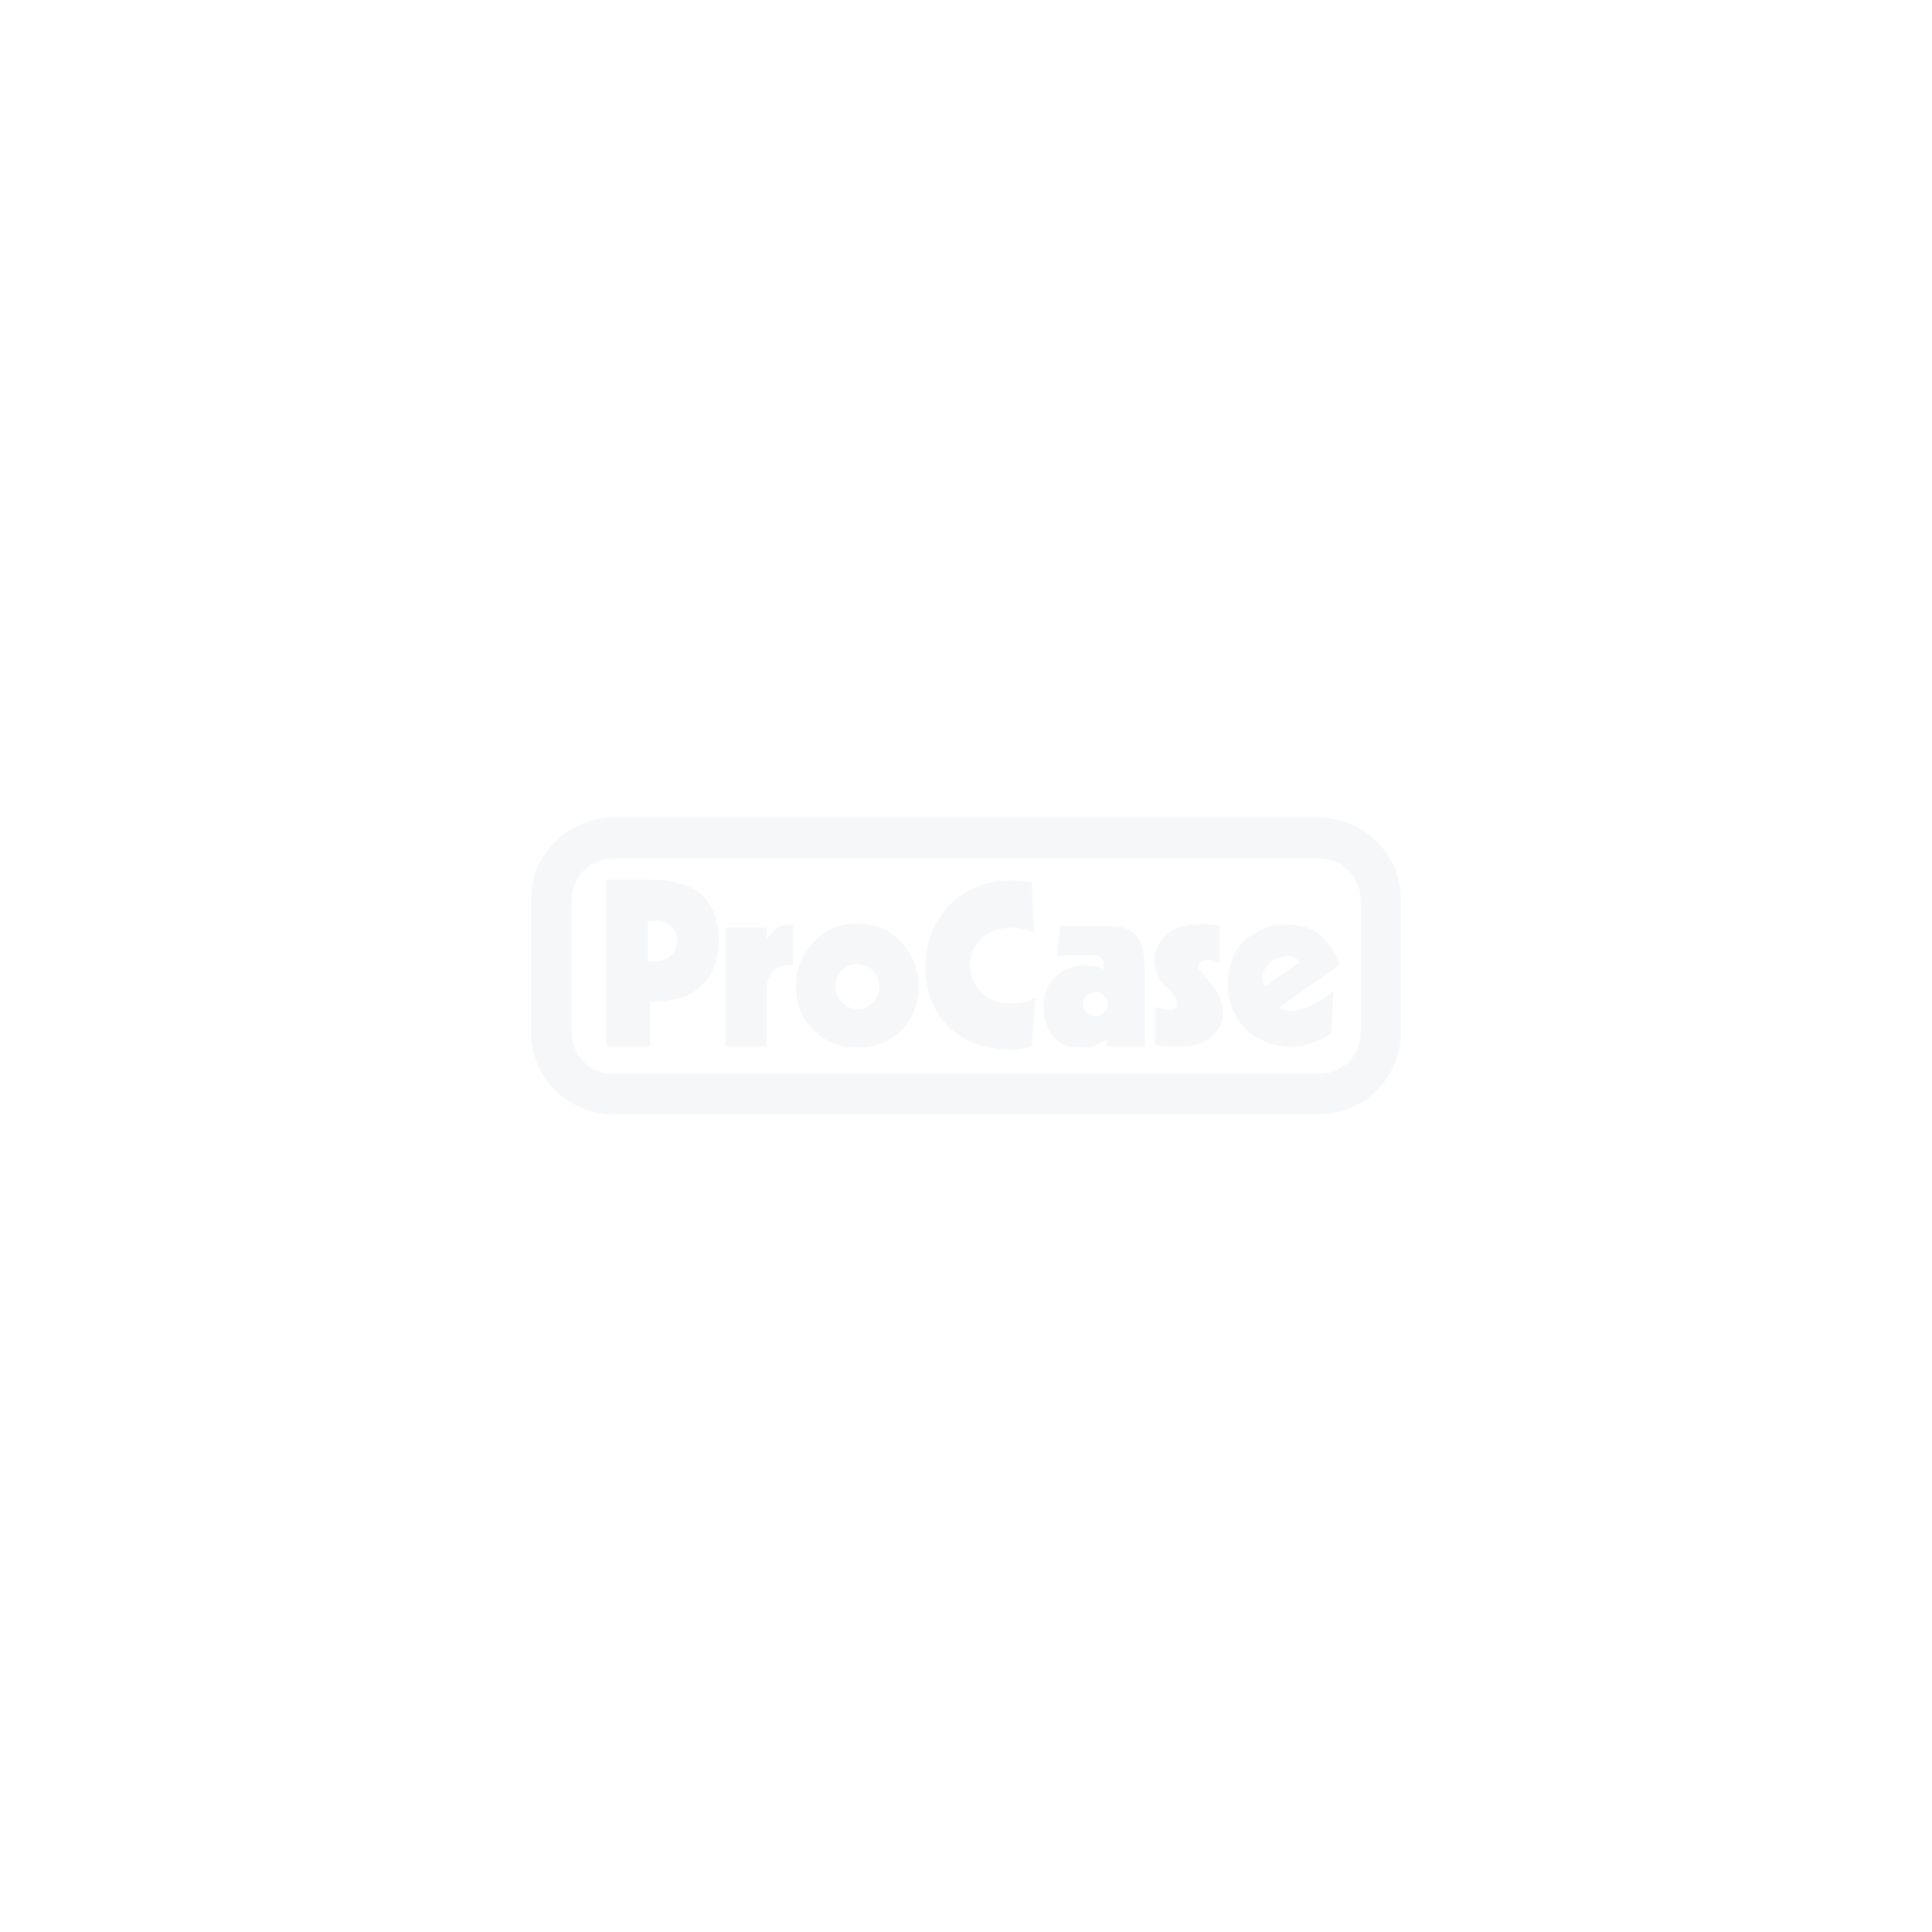 Uni Trägerplattencase 5